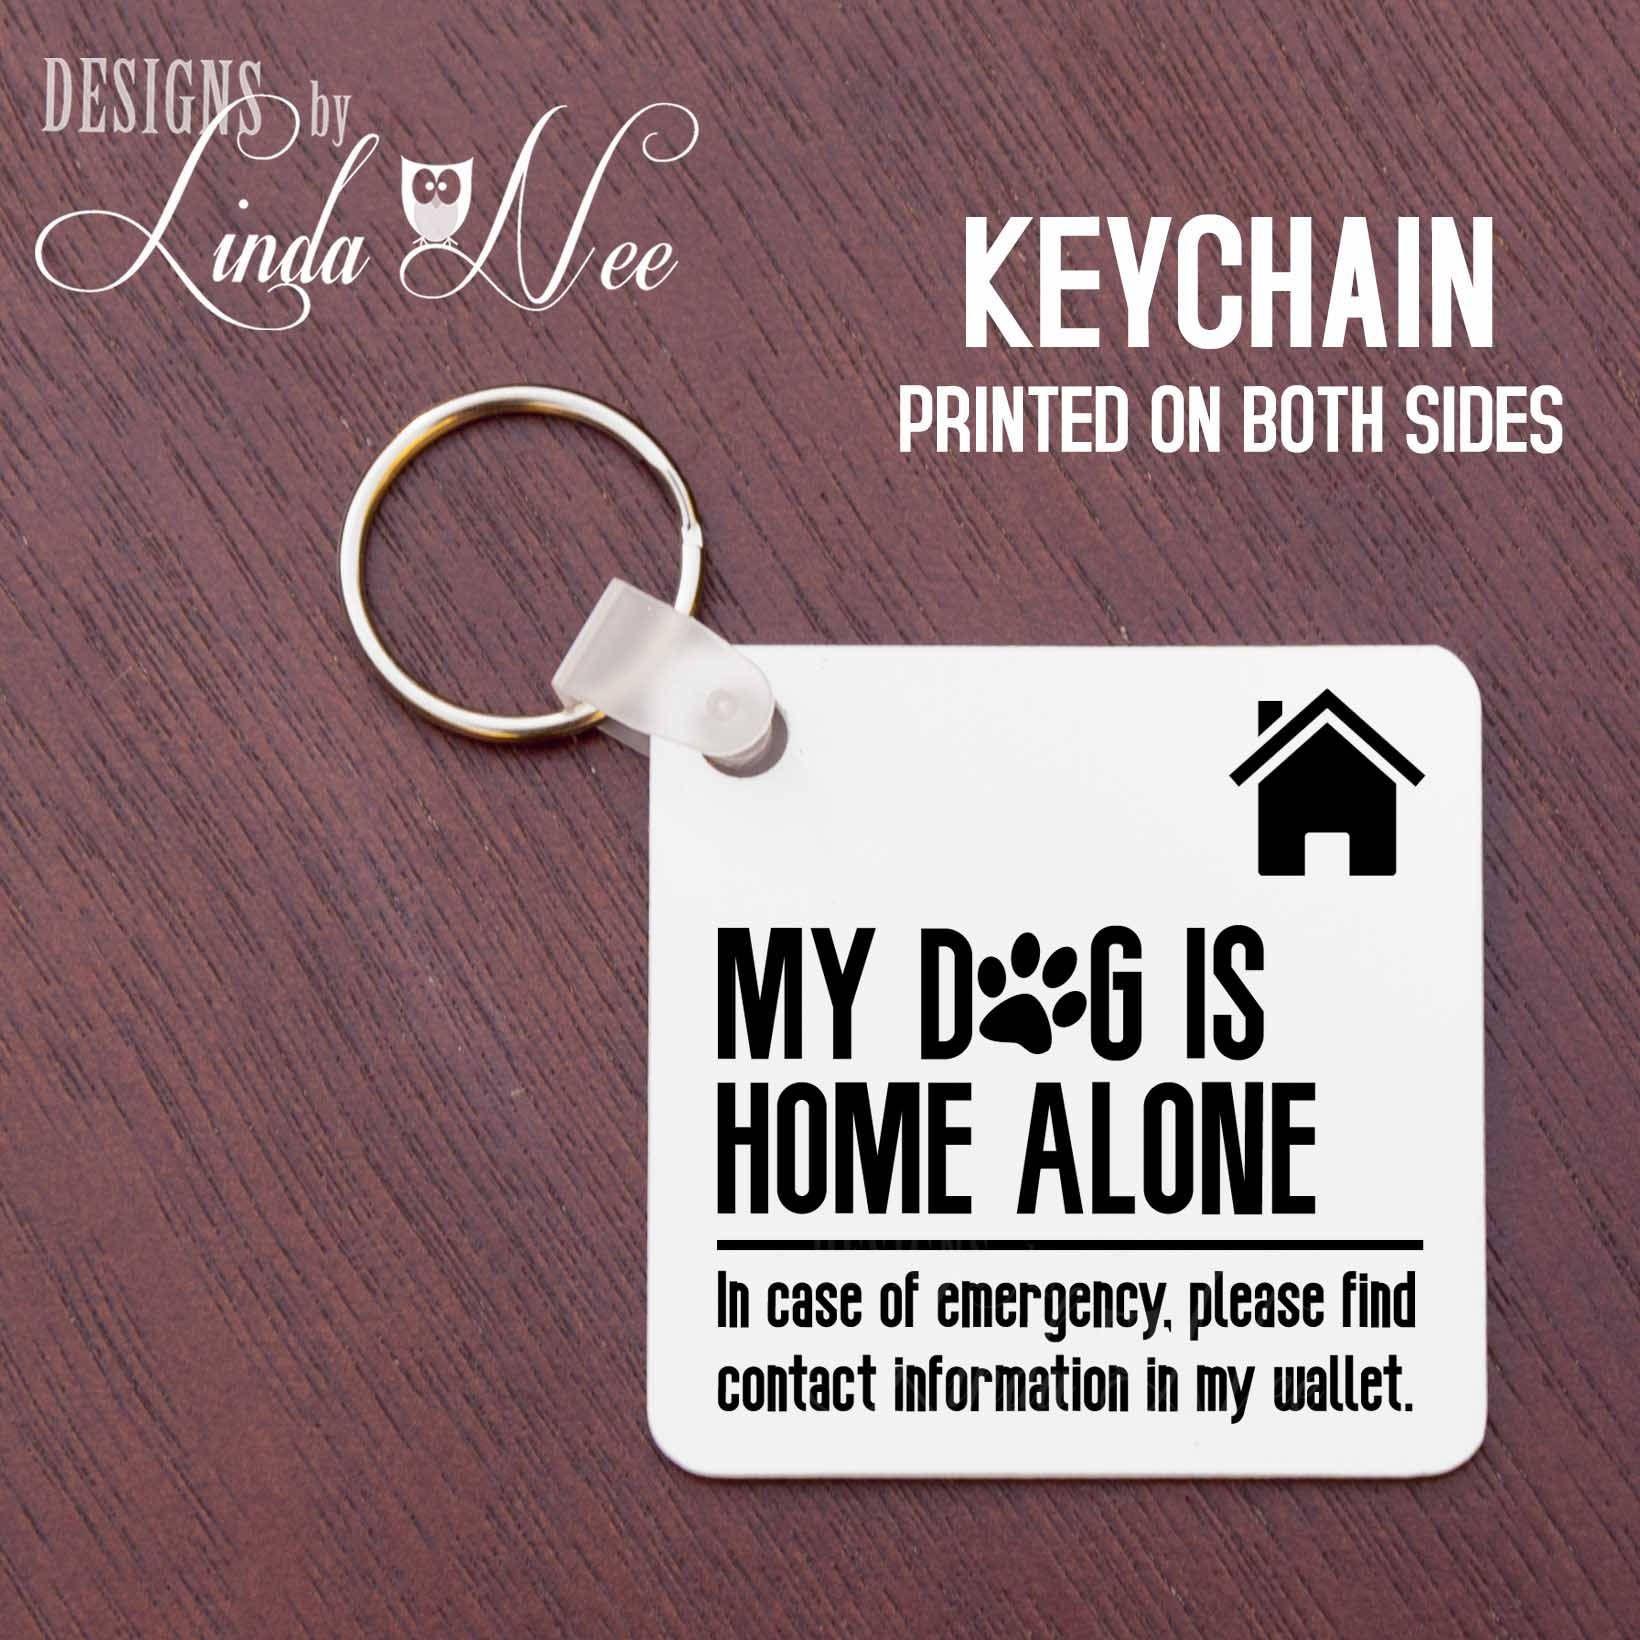 Pet Alert Keychain, My Dog is Home Alone Keychain